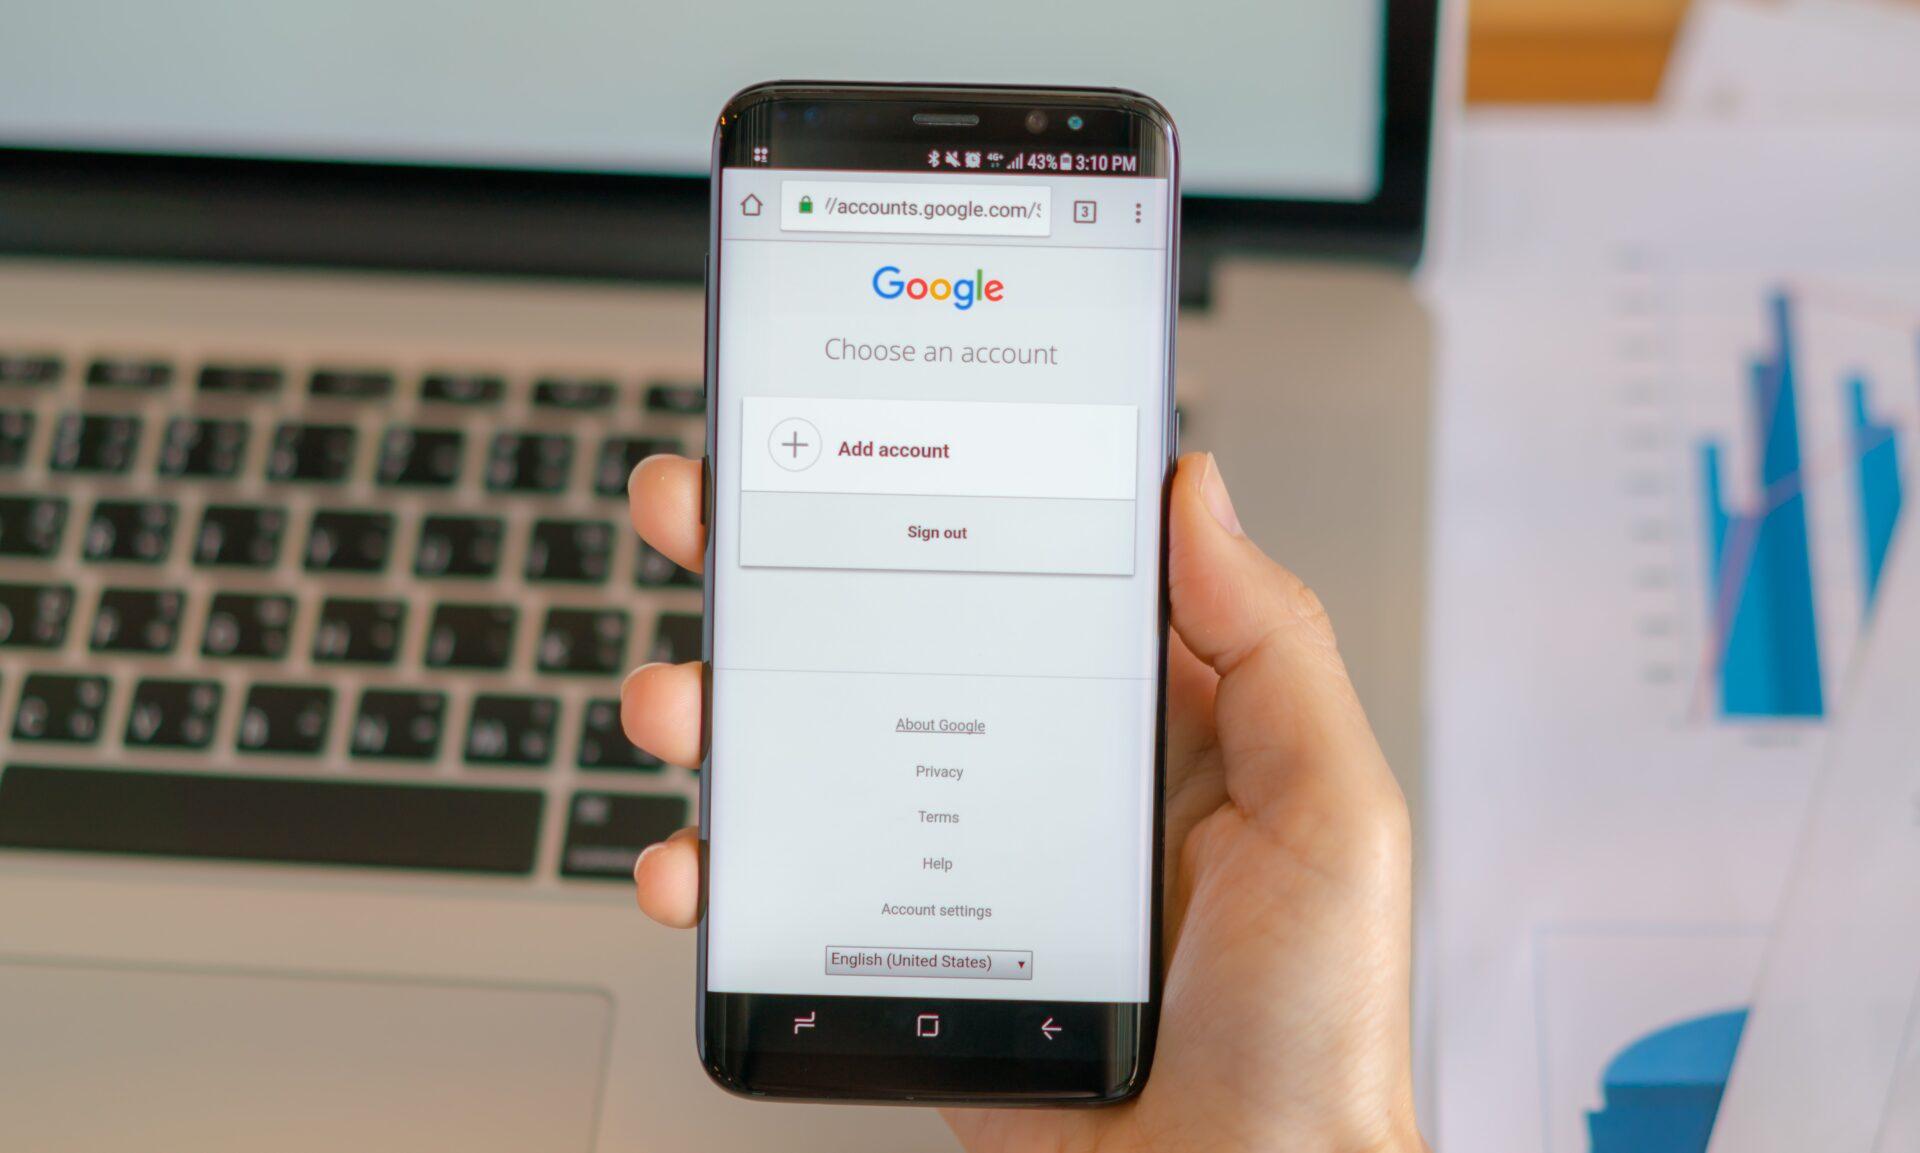 Google Job Search Widget Comes Under Fire